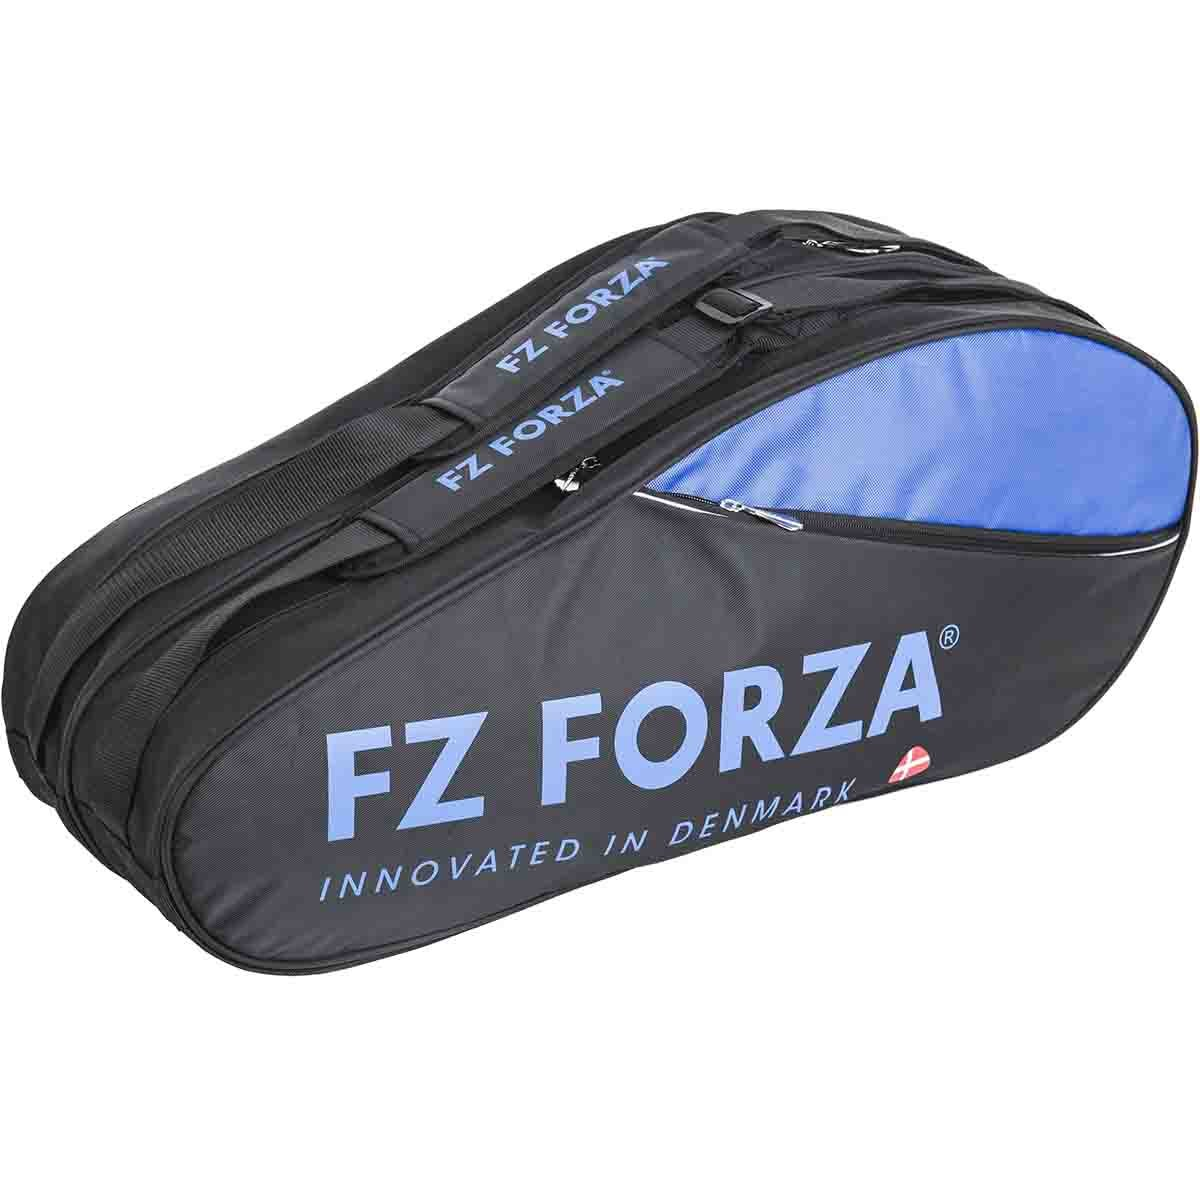 Køb FZ FORZA Ark Badmintontaske